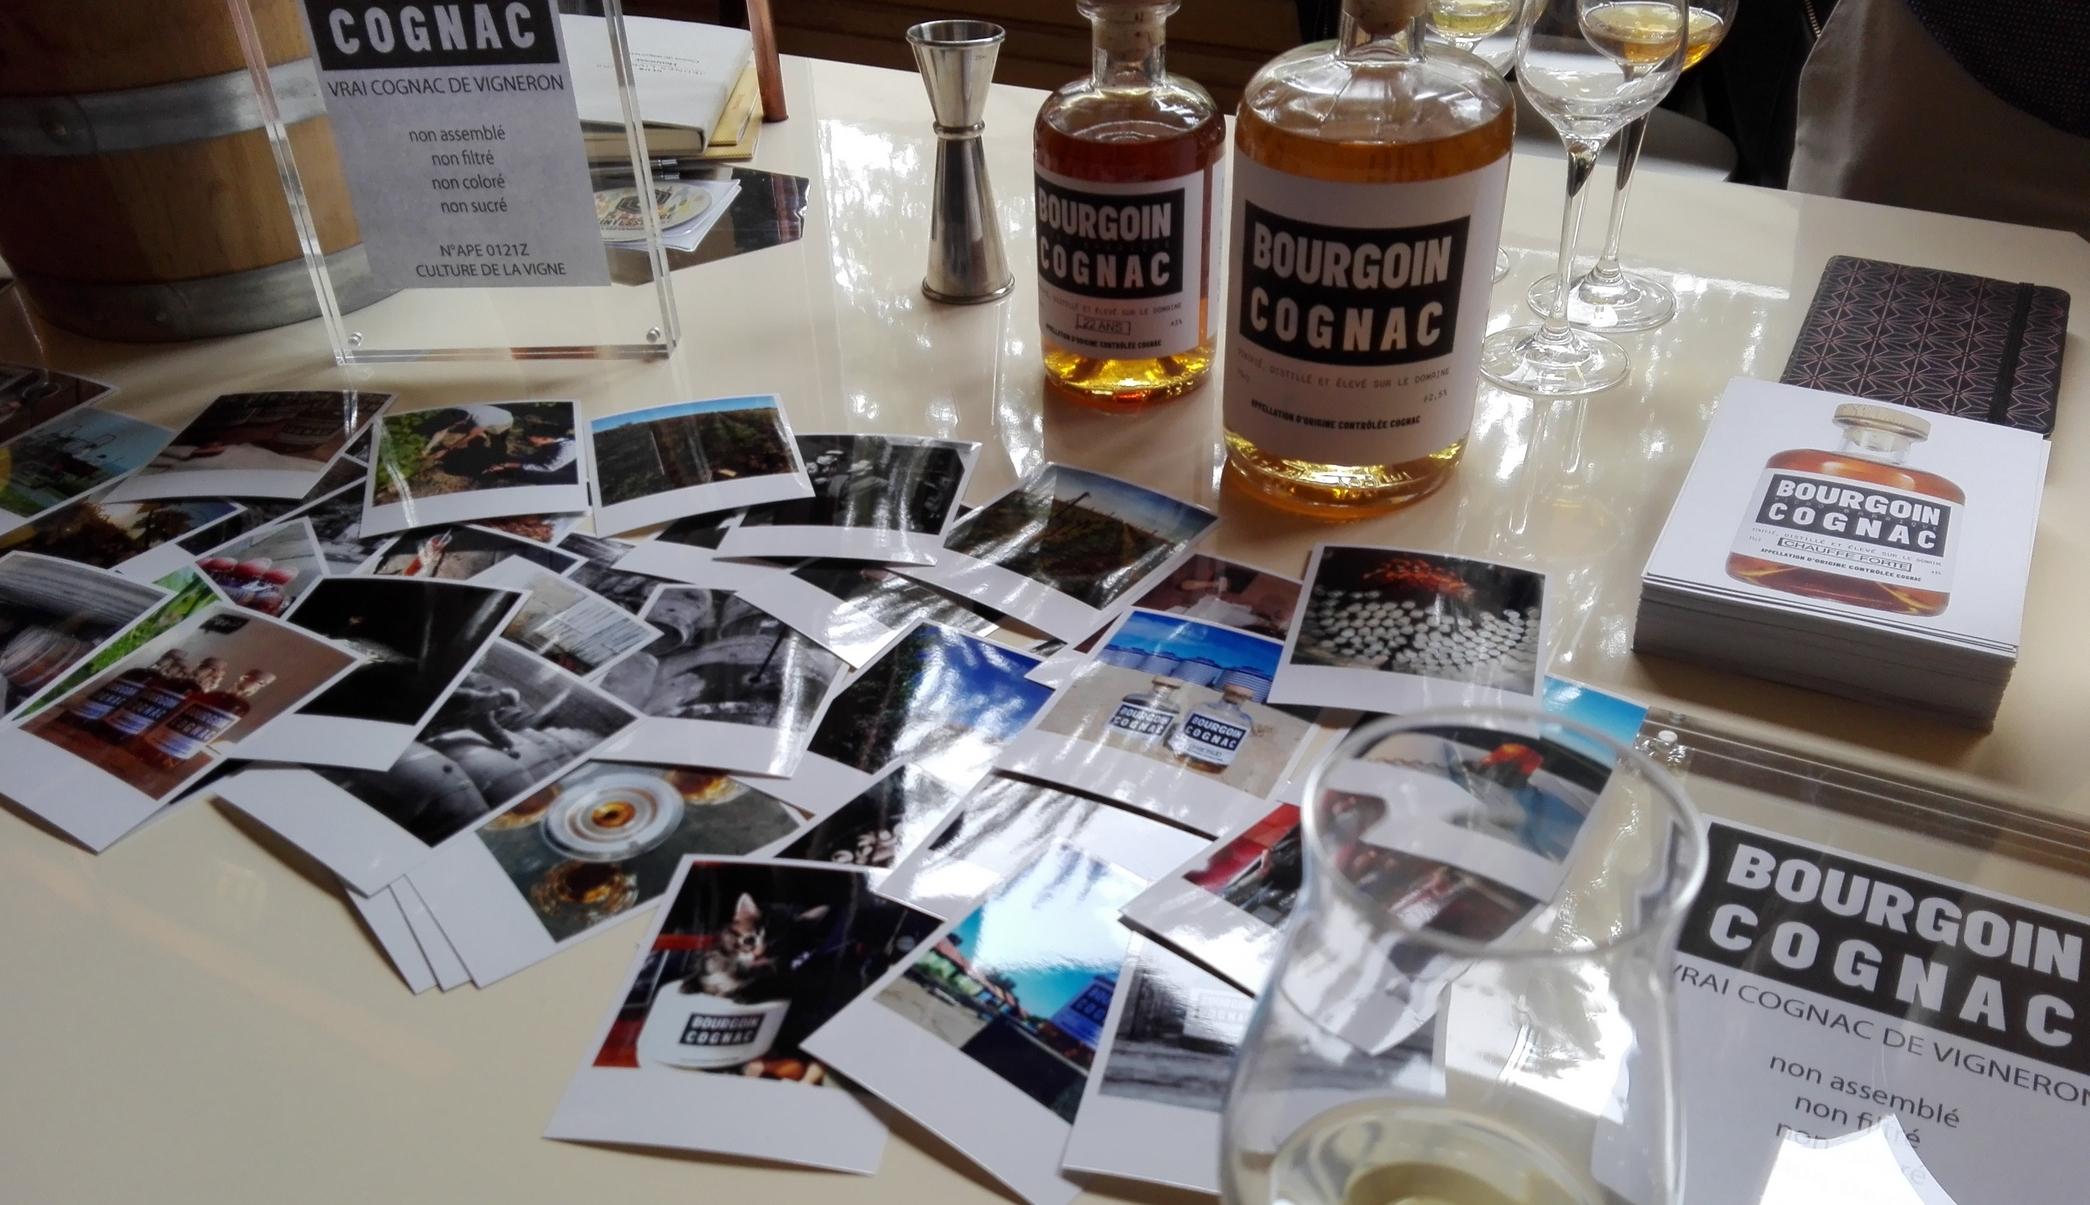 Bourgoin Cognac - France Quintessence 2016